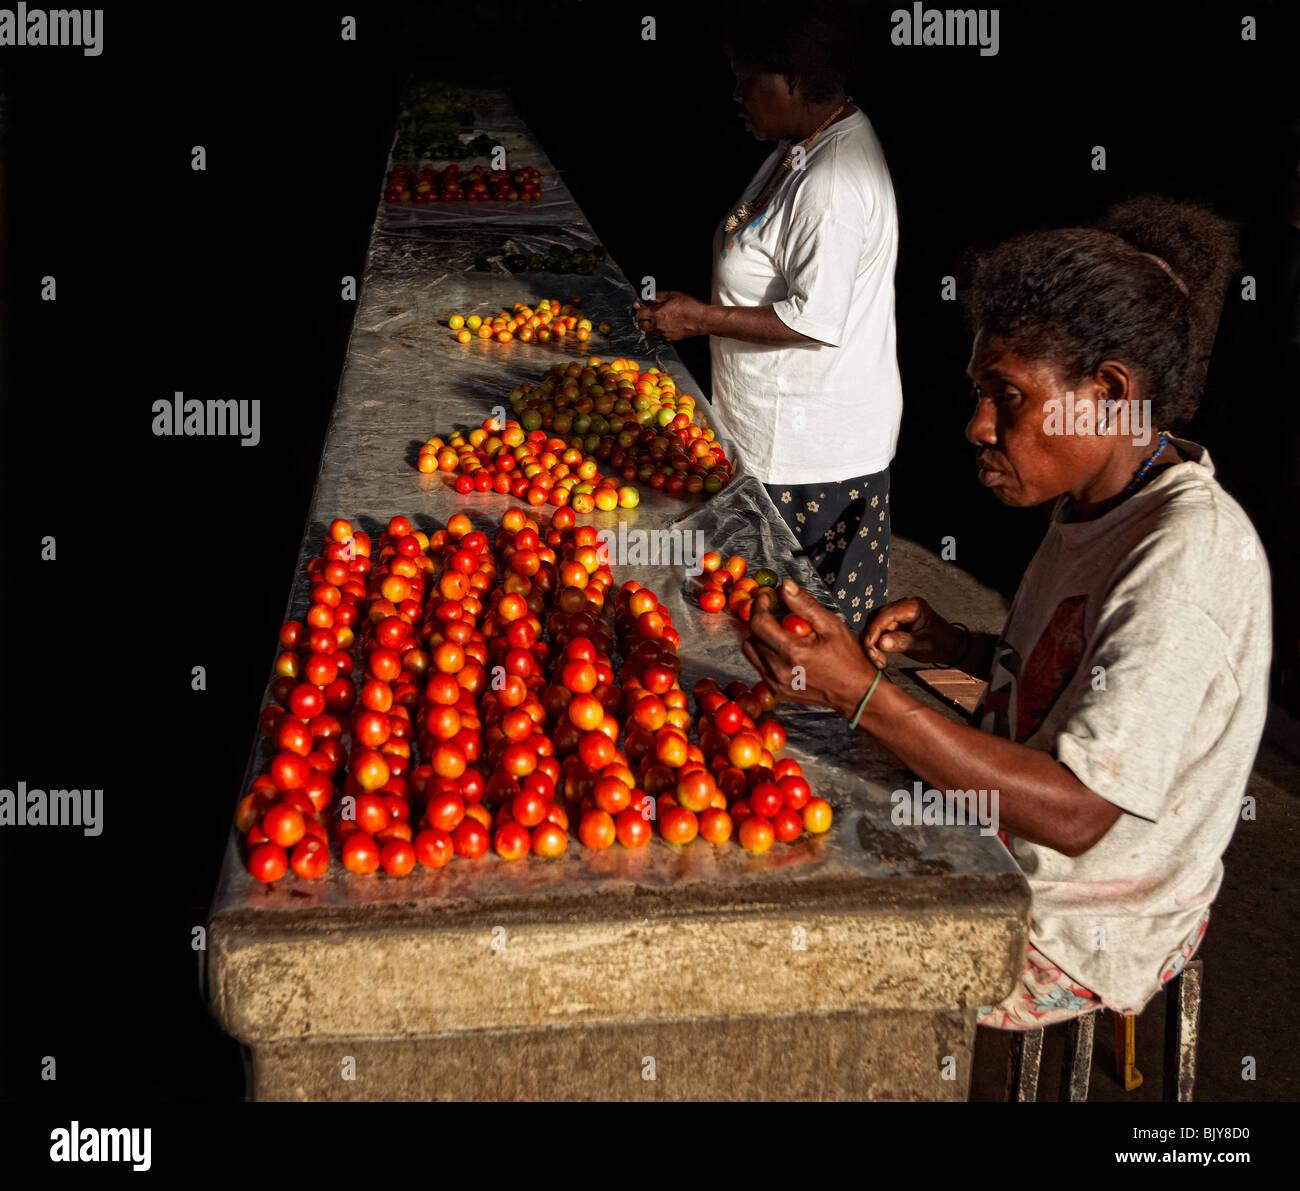 Tomato sellers, Honiara market, Solomon Islands - Stock Image